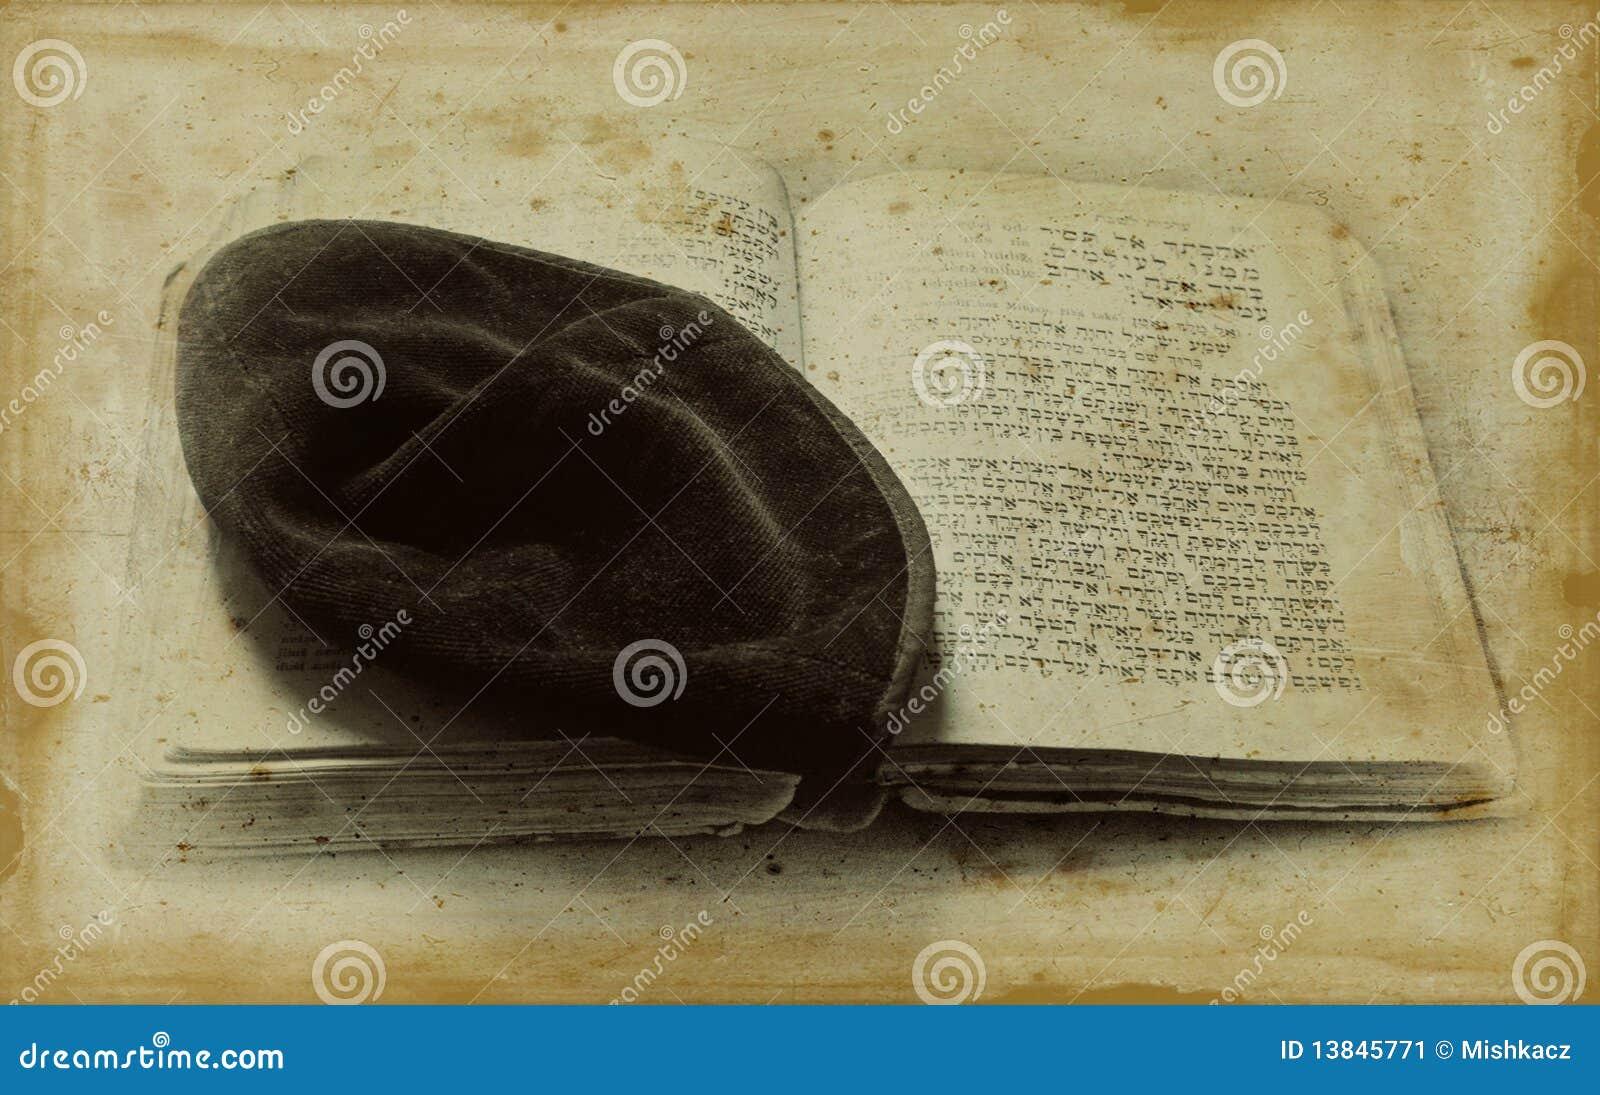 Old Jewish symbols